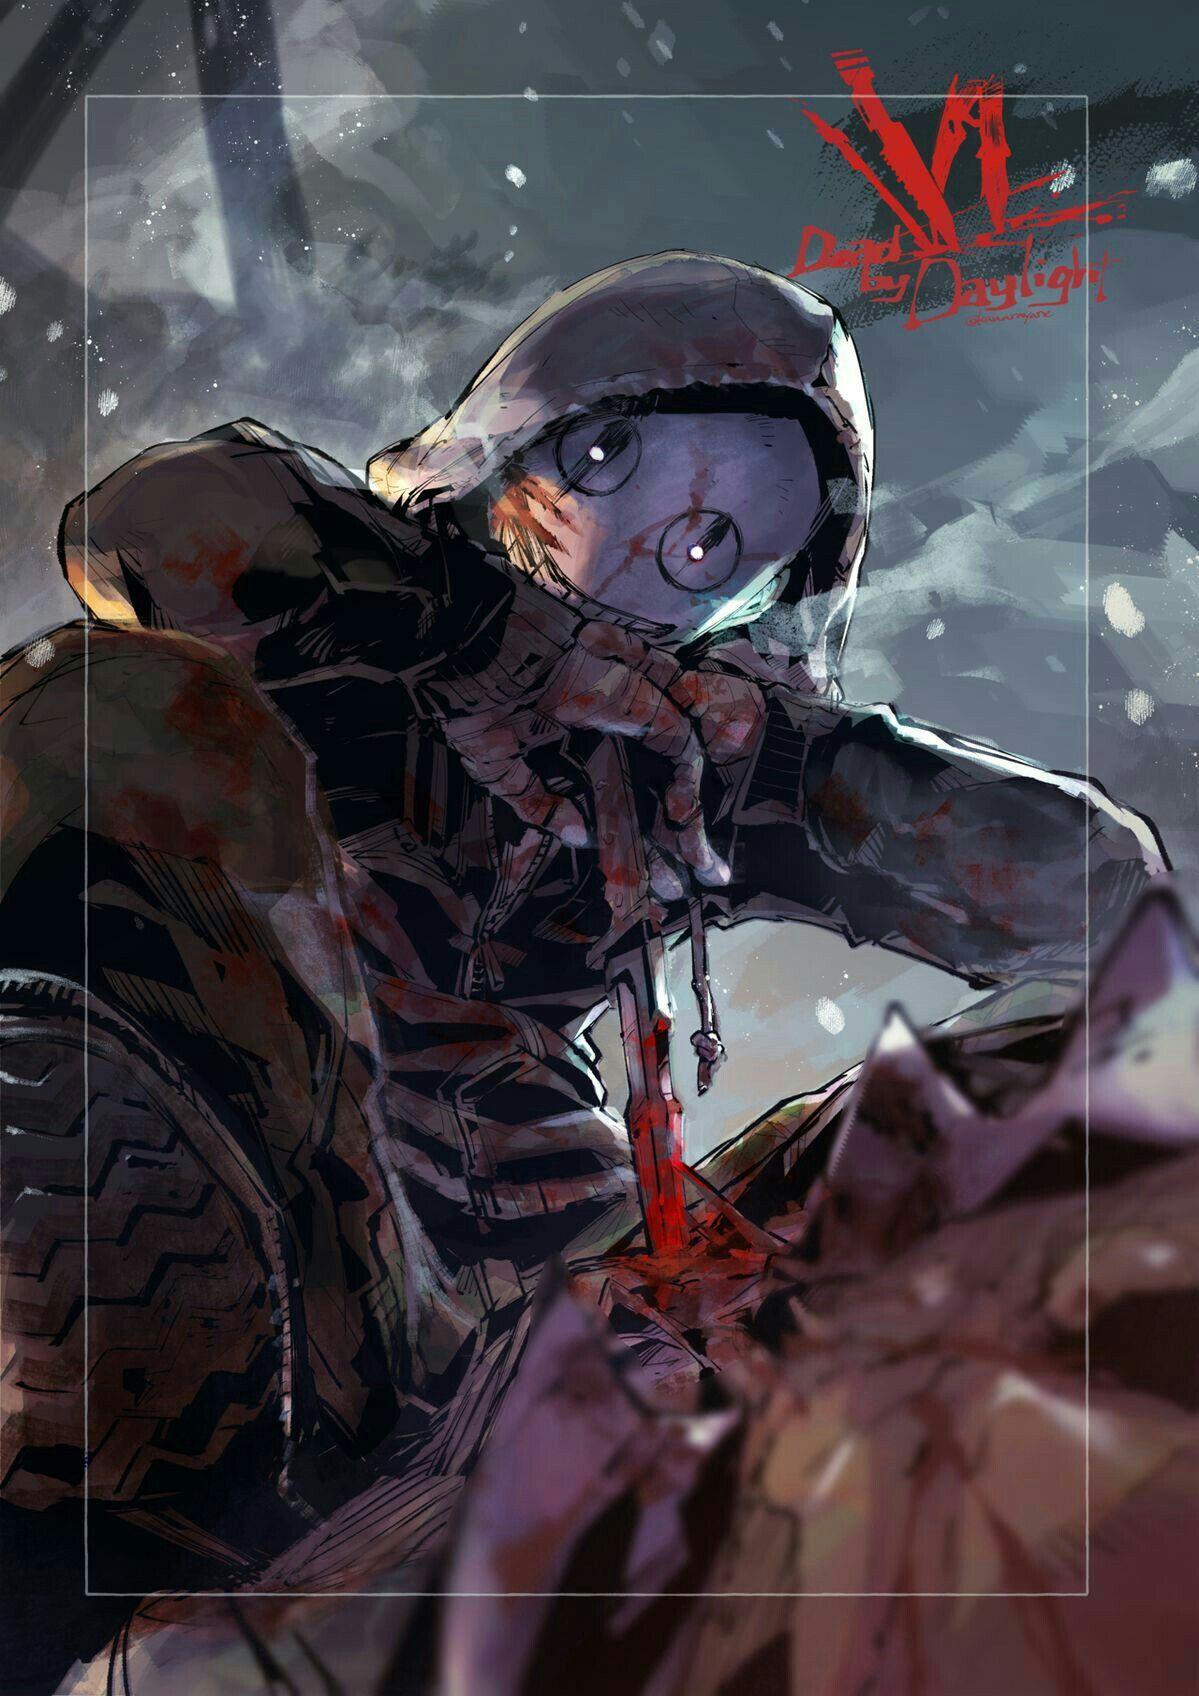 Imagen de A Lost Cause en Dead By Daylight Personajes de